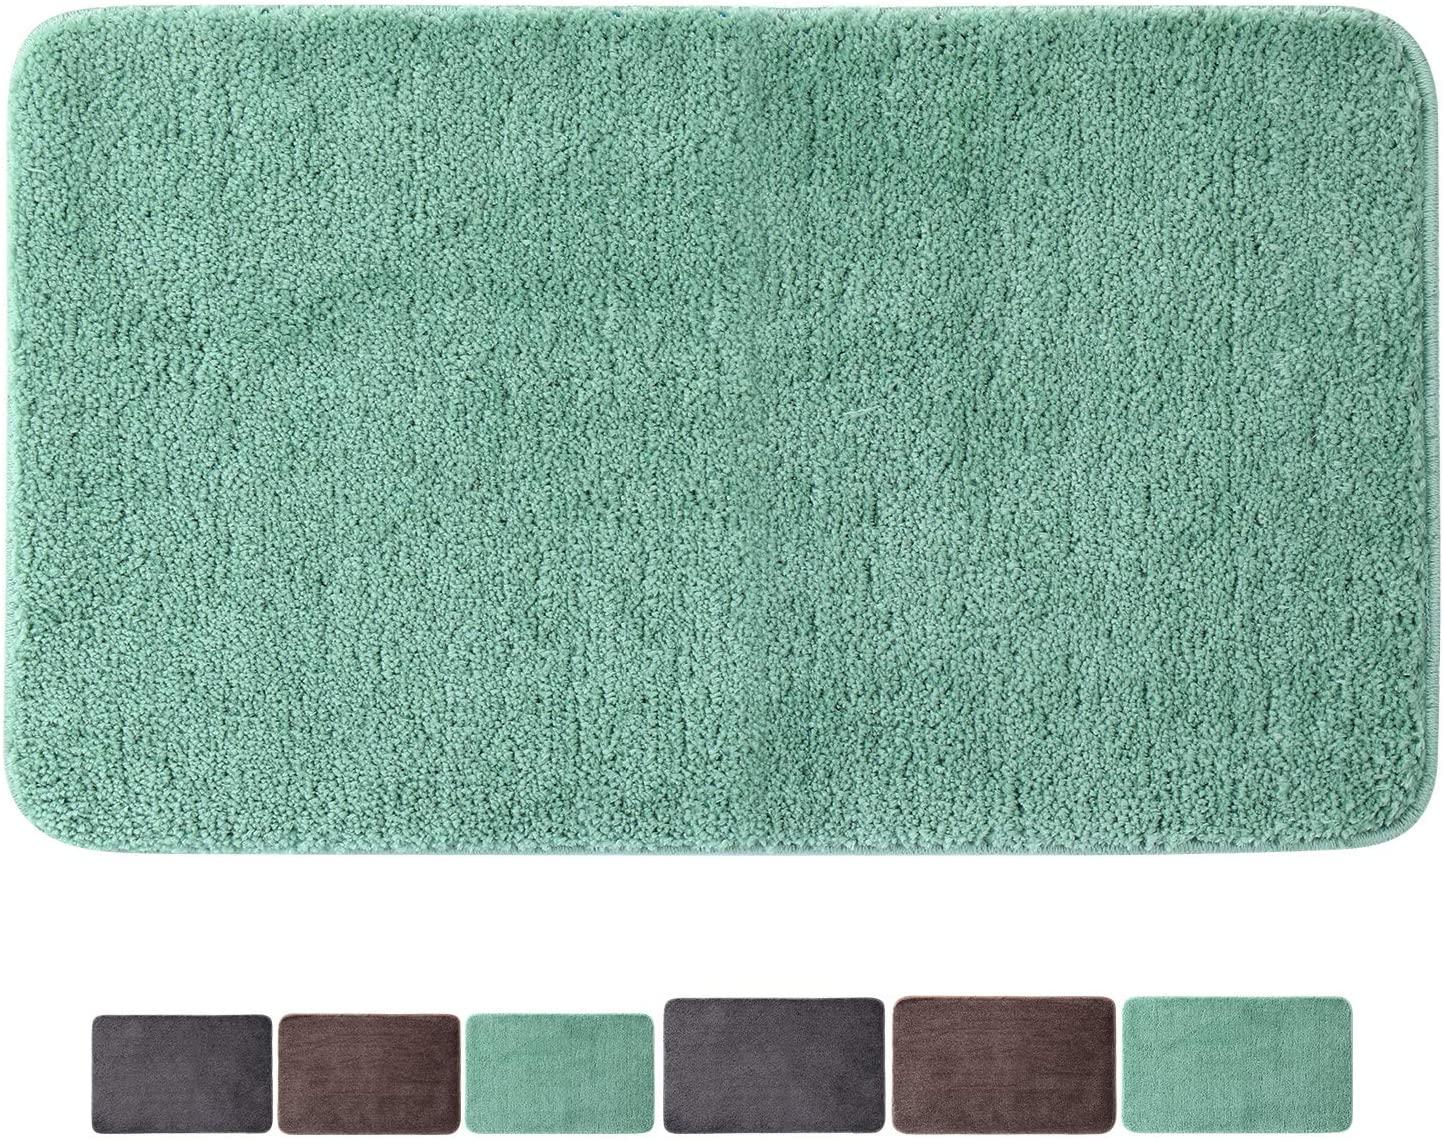 Microfiber Floor Rug Non-Slip Mats Stronger Water Absorption Machine Washable Doormats for Indoor Hotel by Bathtub Bedroom Washing Table Living Room Outside Bathroom (28